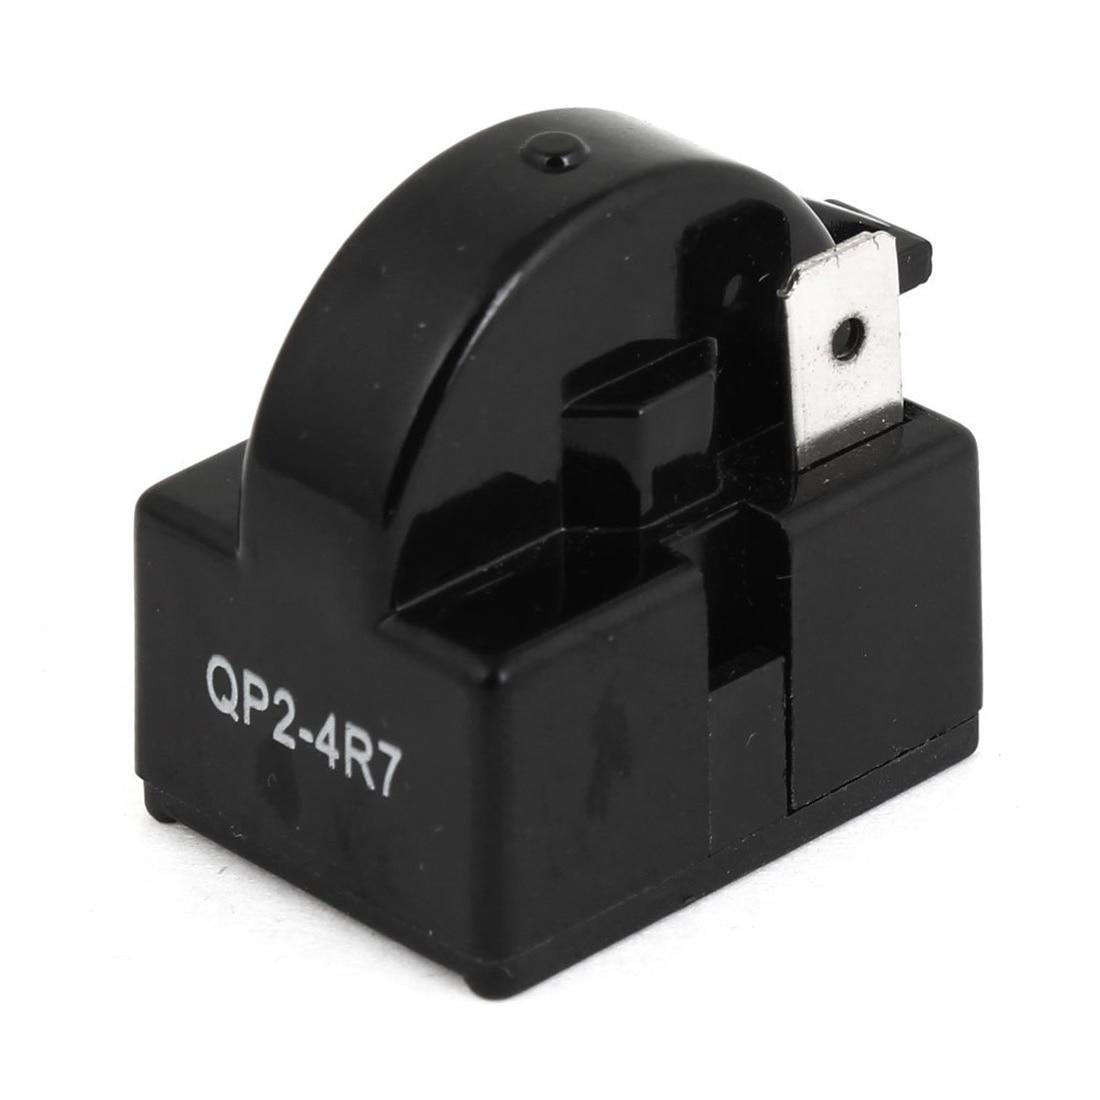 4 7 ohm 1 pin refrigerator ptc starter relay black in. Black Bedroom Furniture Sets. Home Design Ideas